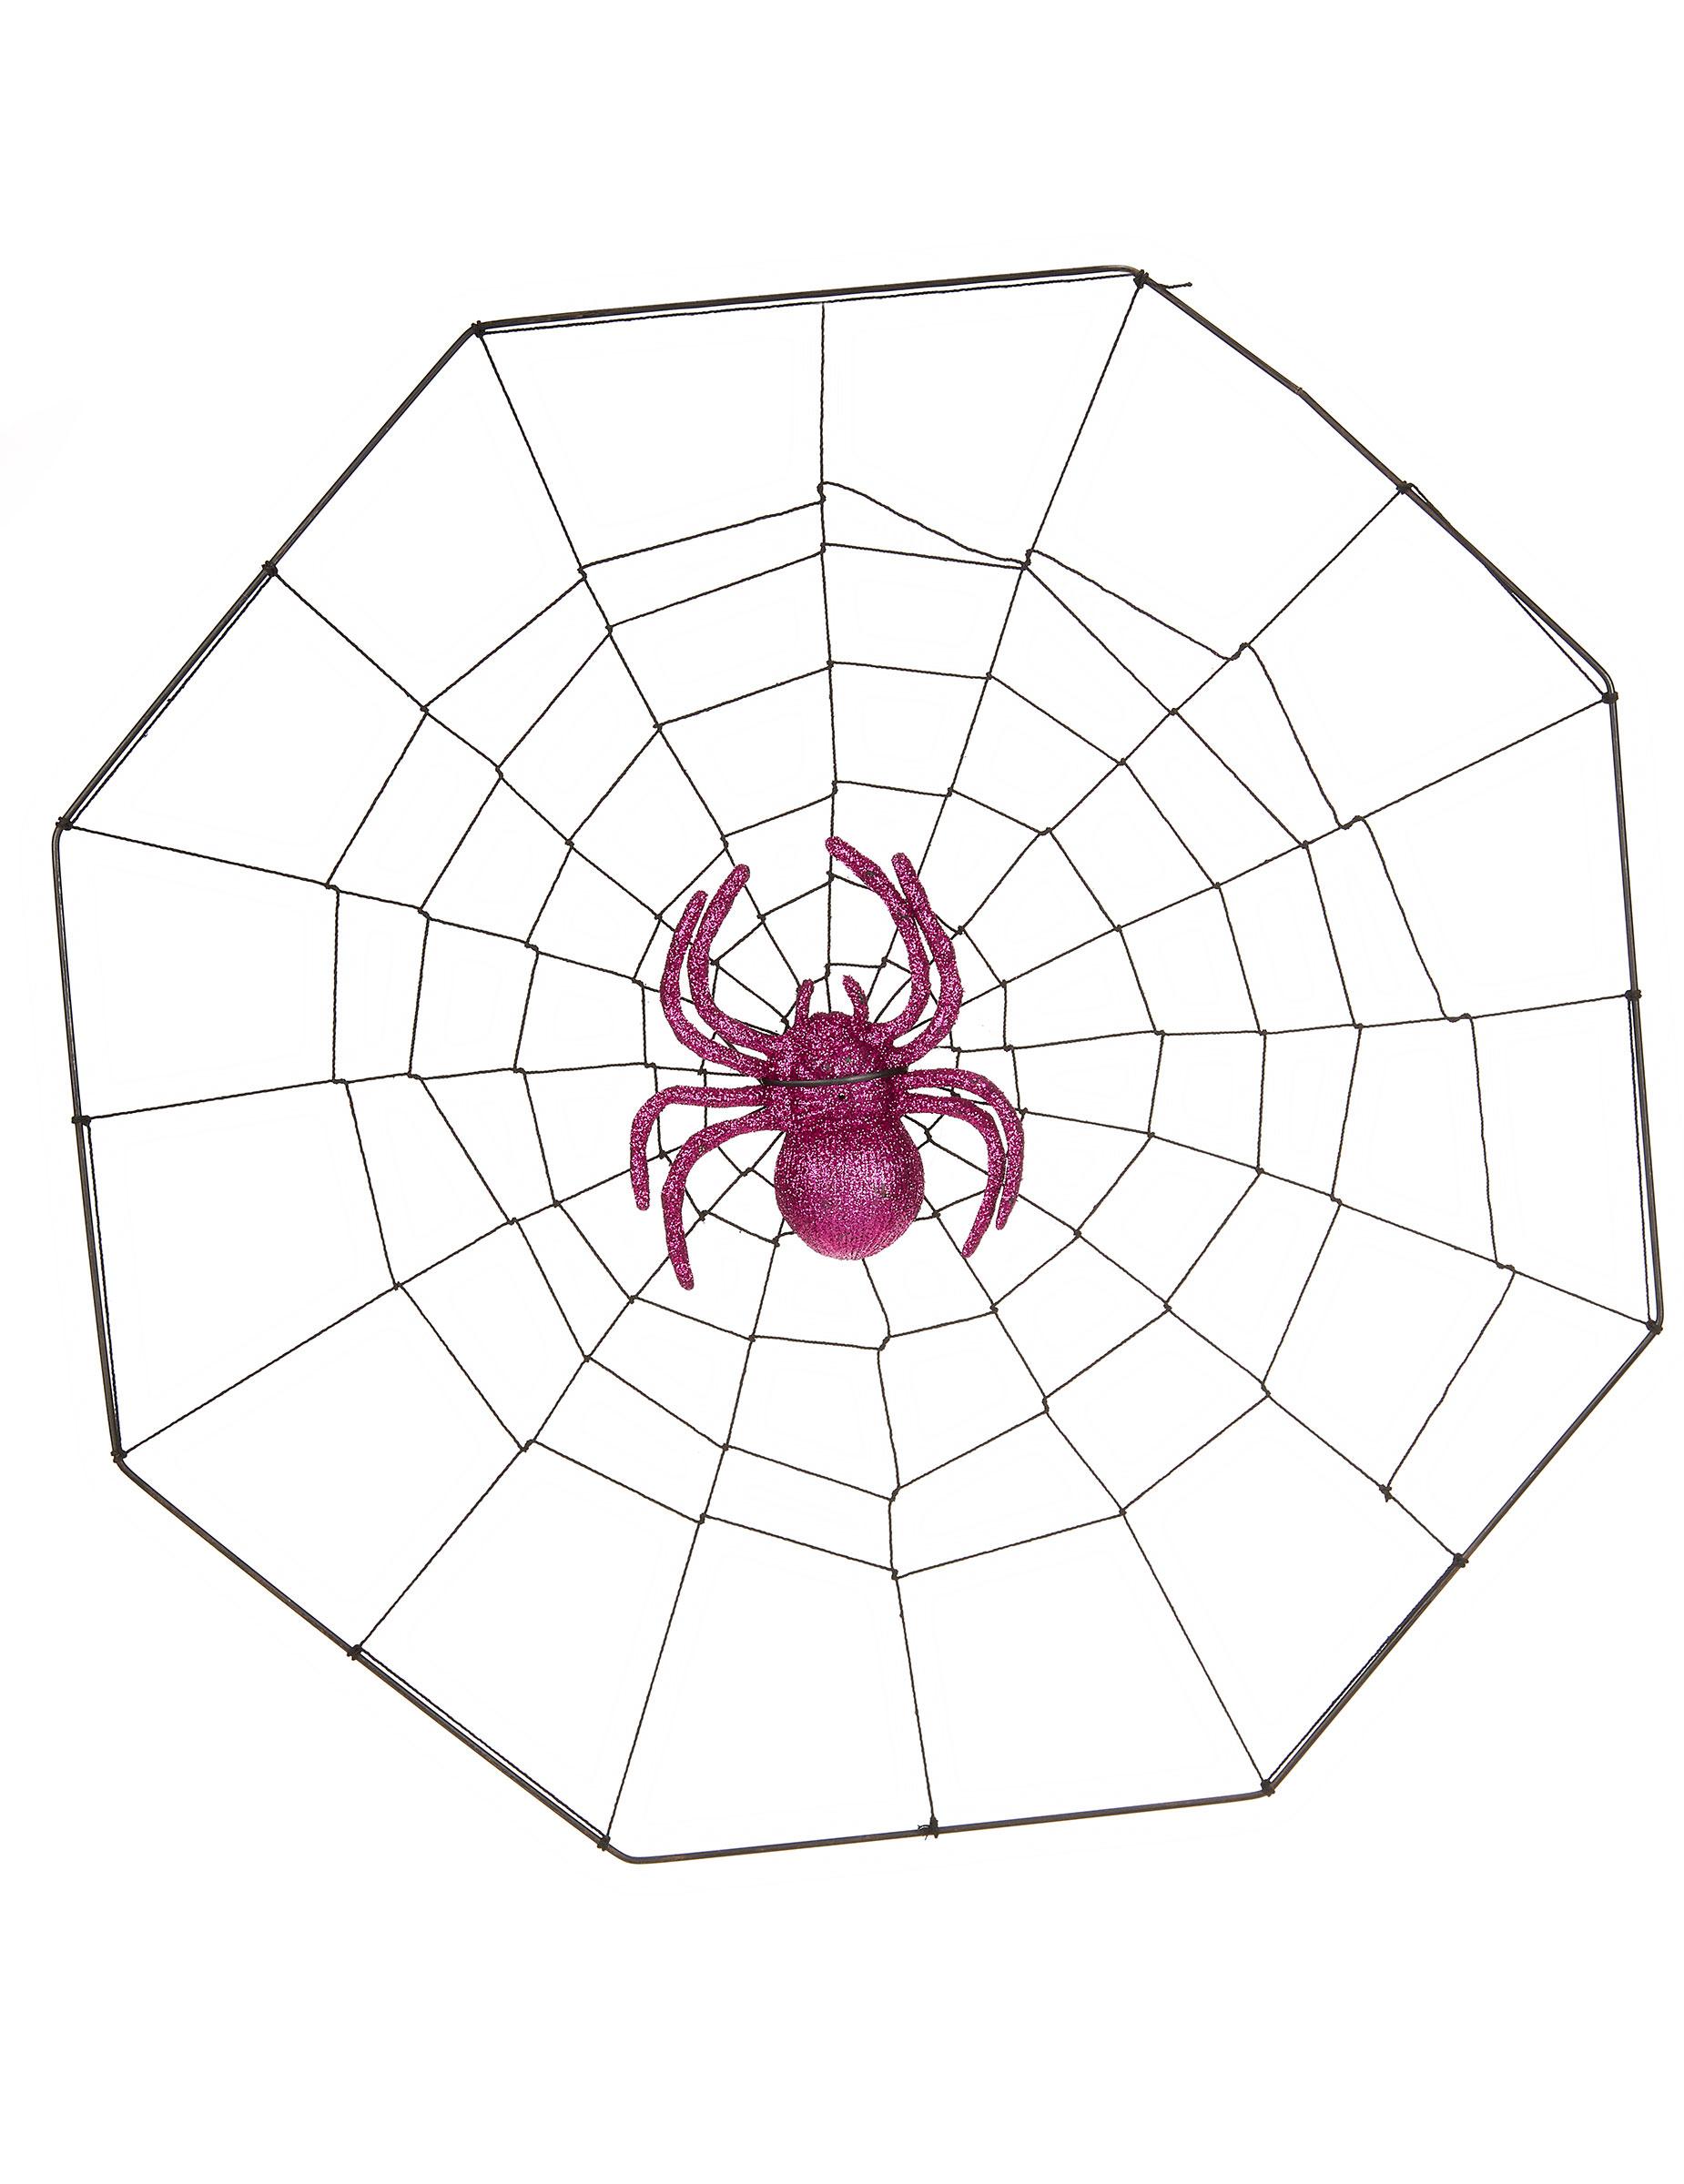 toile d 39 araign e ventouse halloween d coration. Black Bedroom Furniture Sets. Home Design Ideas